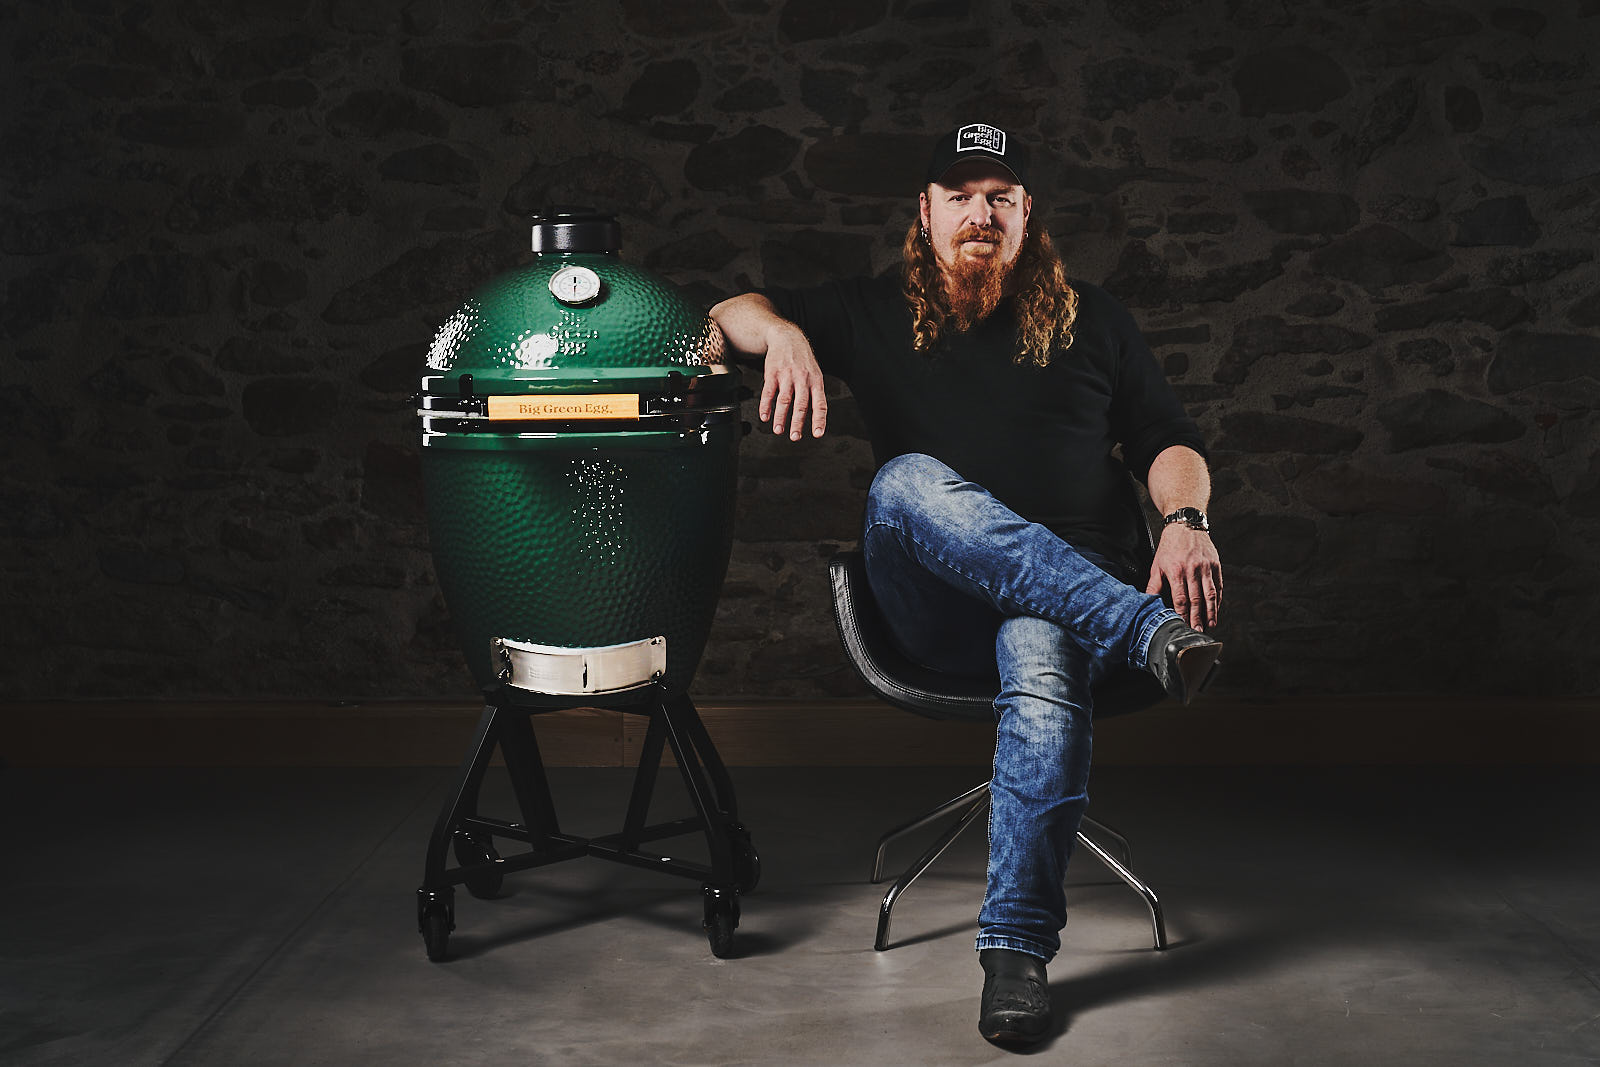 Big green egg Werbefoto mit Ludwig Maurer